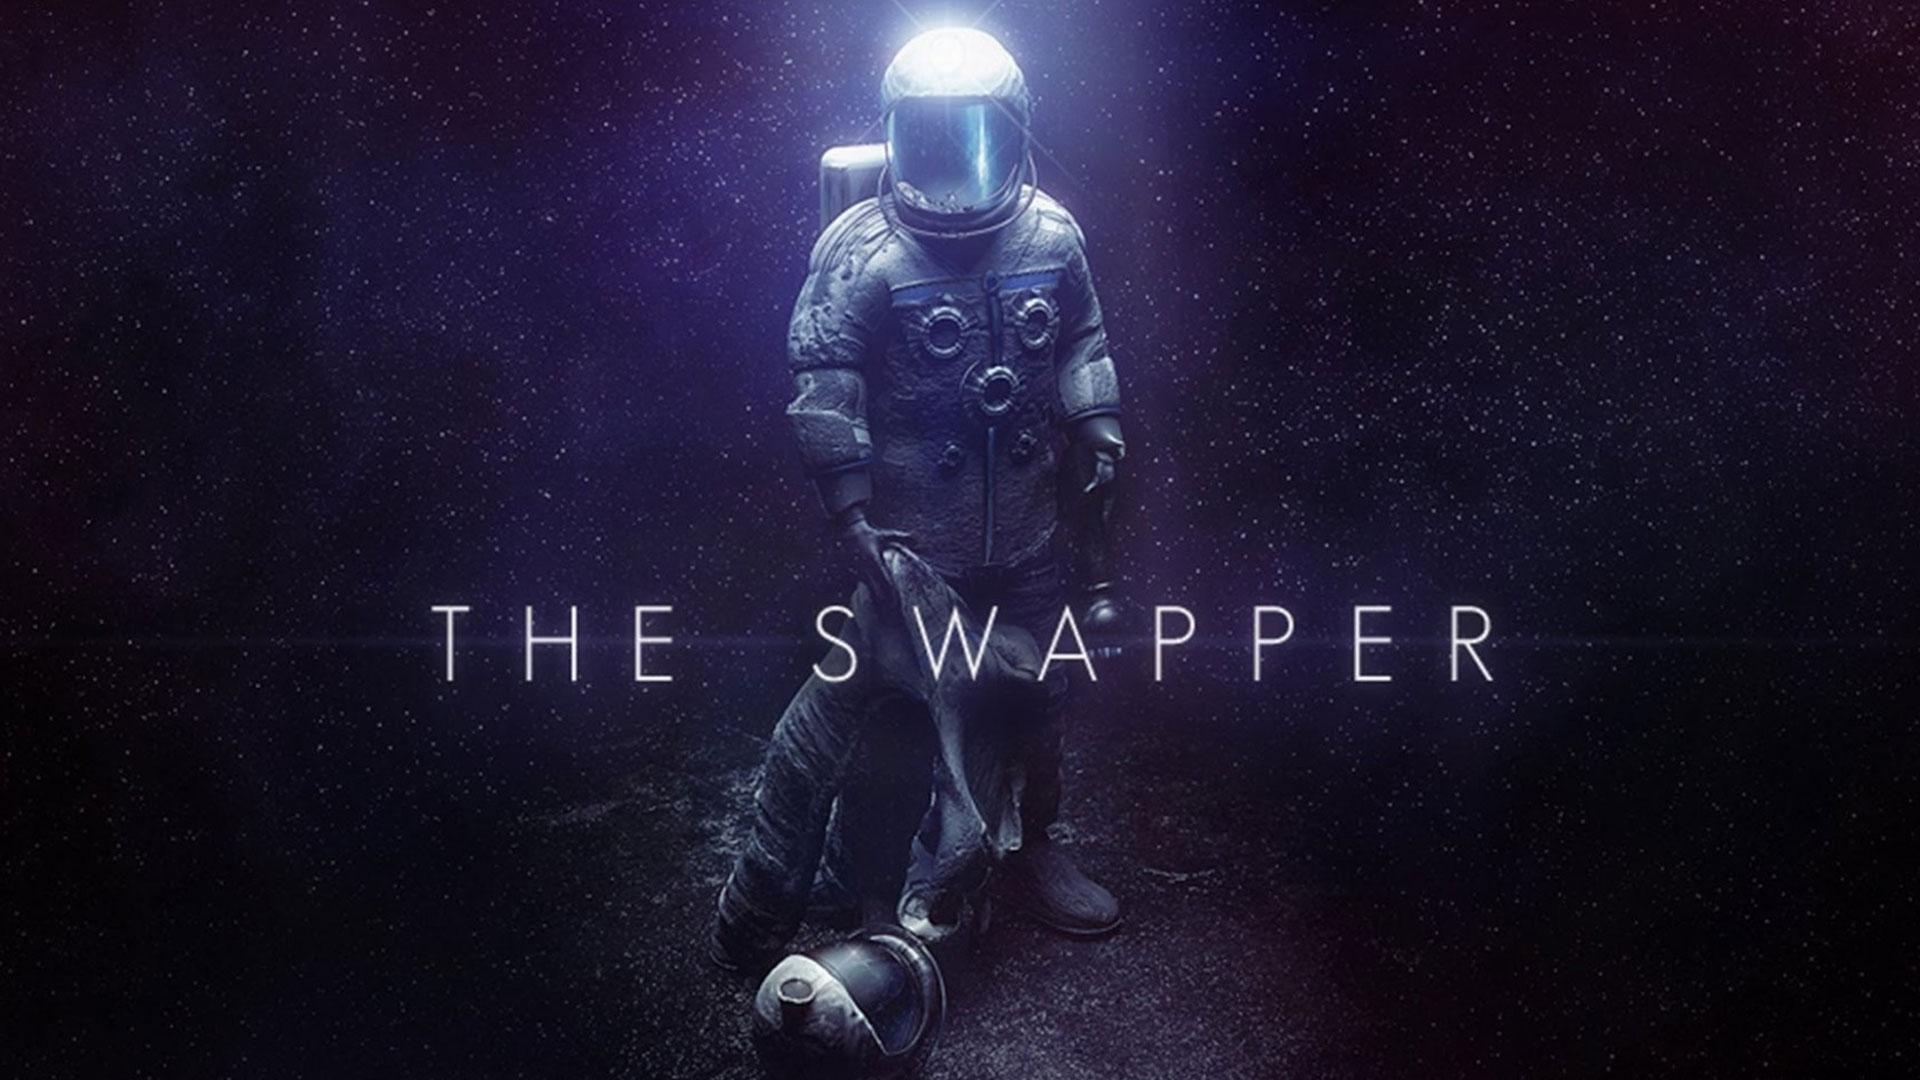 The Swapper Wallpaper Game HD Wallpaper 1080p 1920x1080